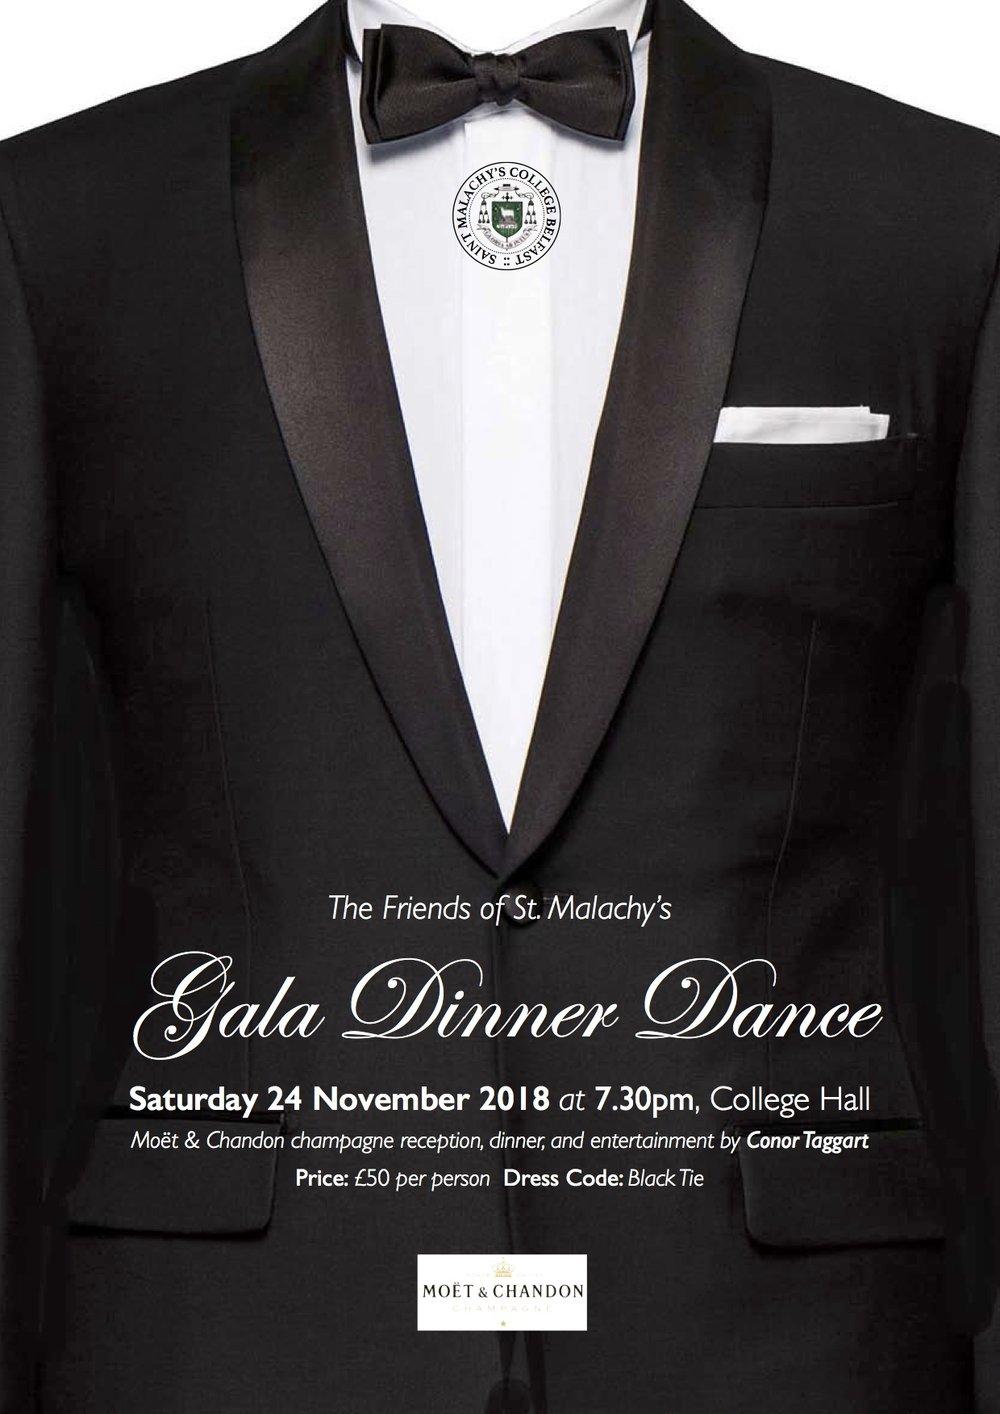 FOSM Dinner Dance poster 2018 copy.jpg